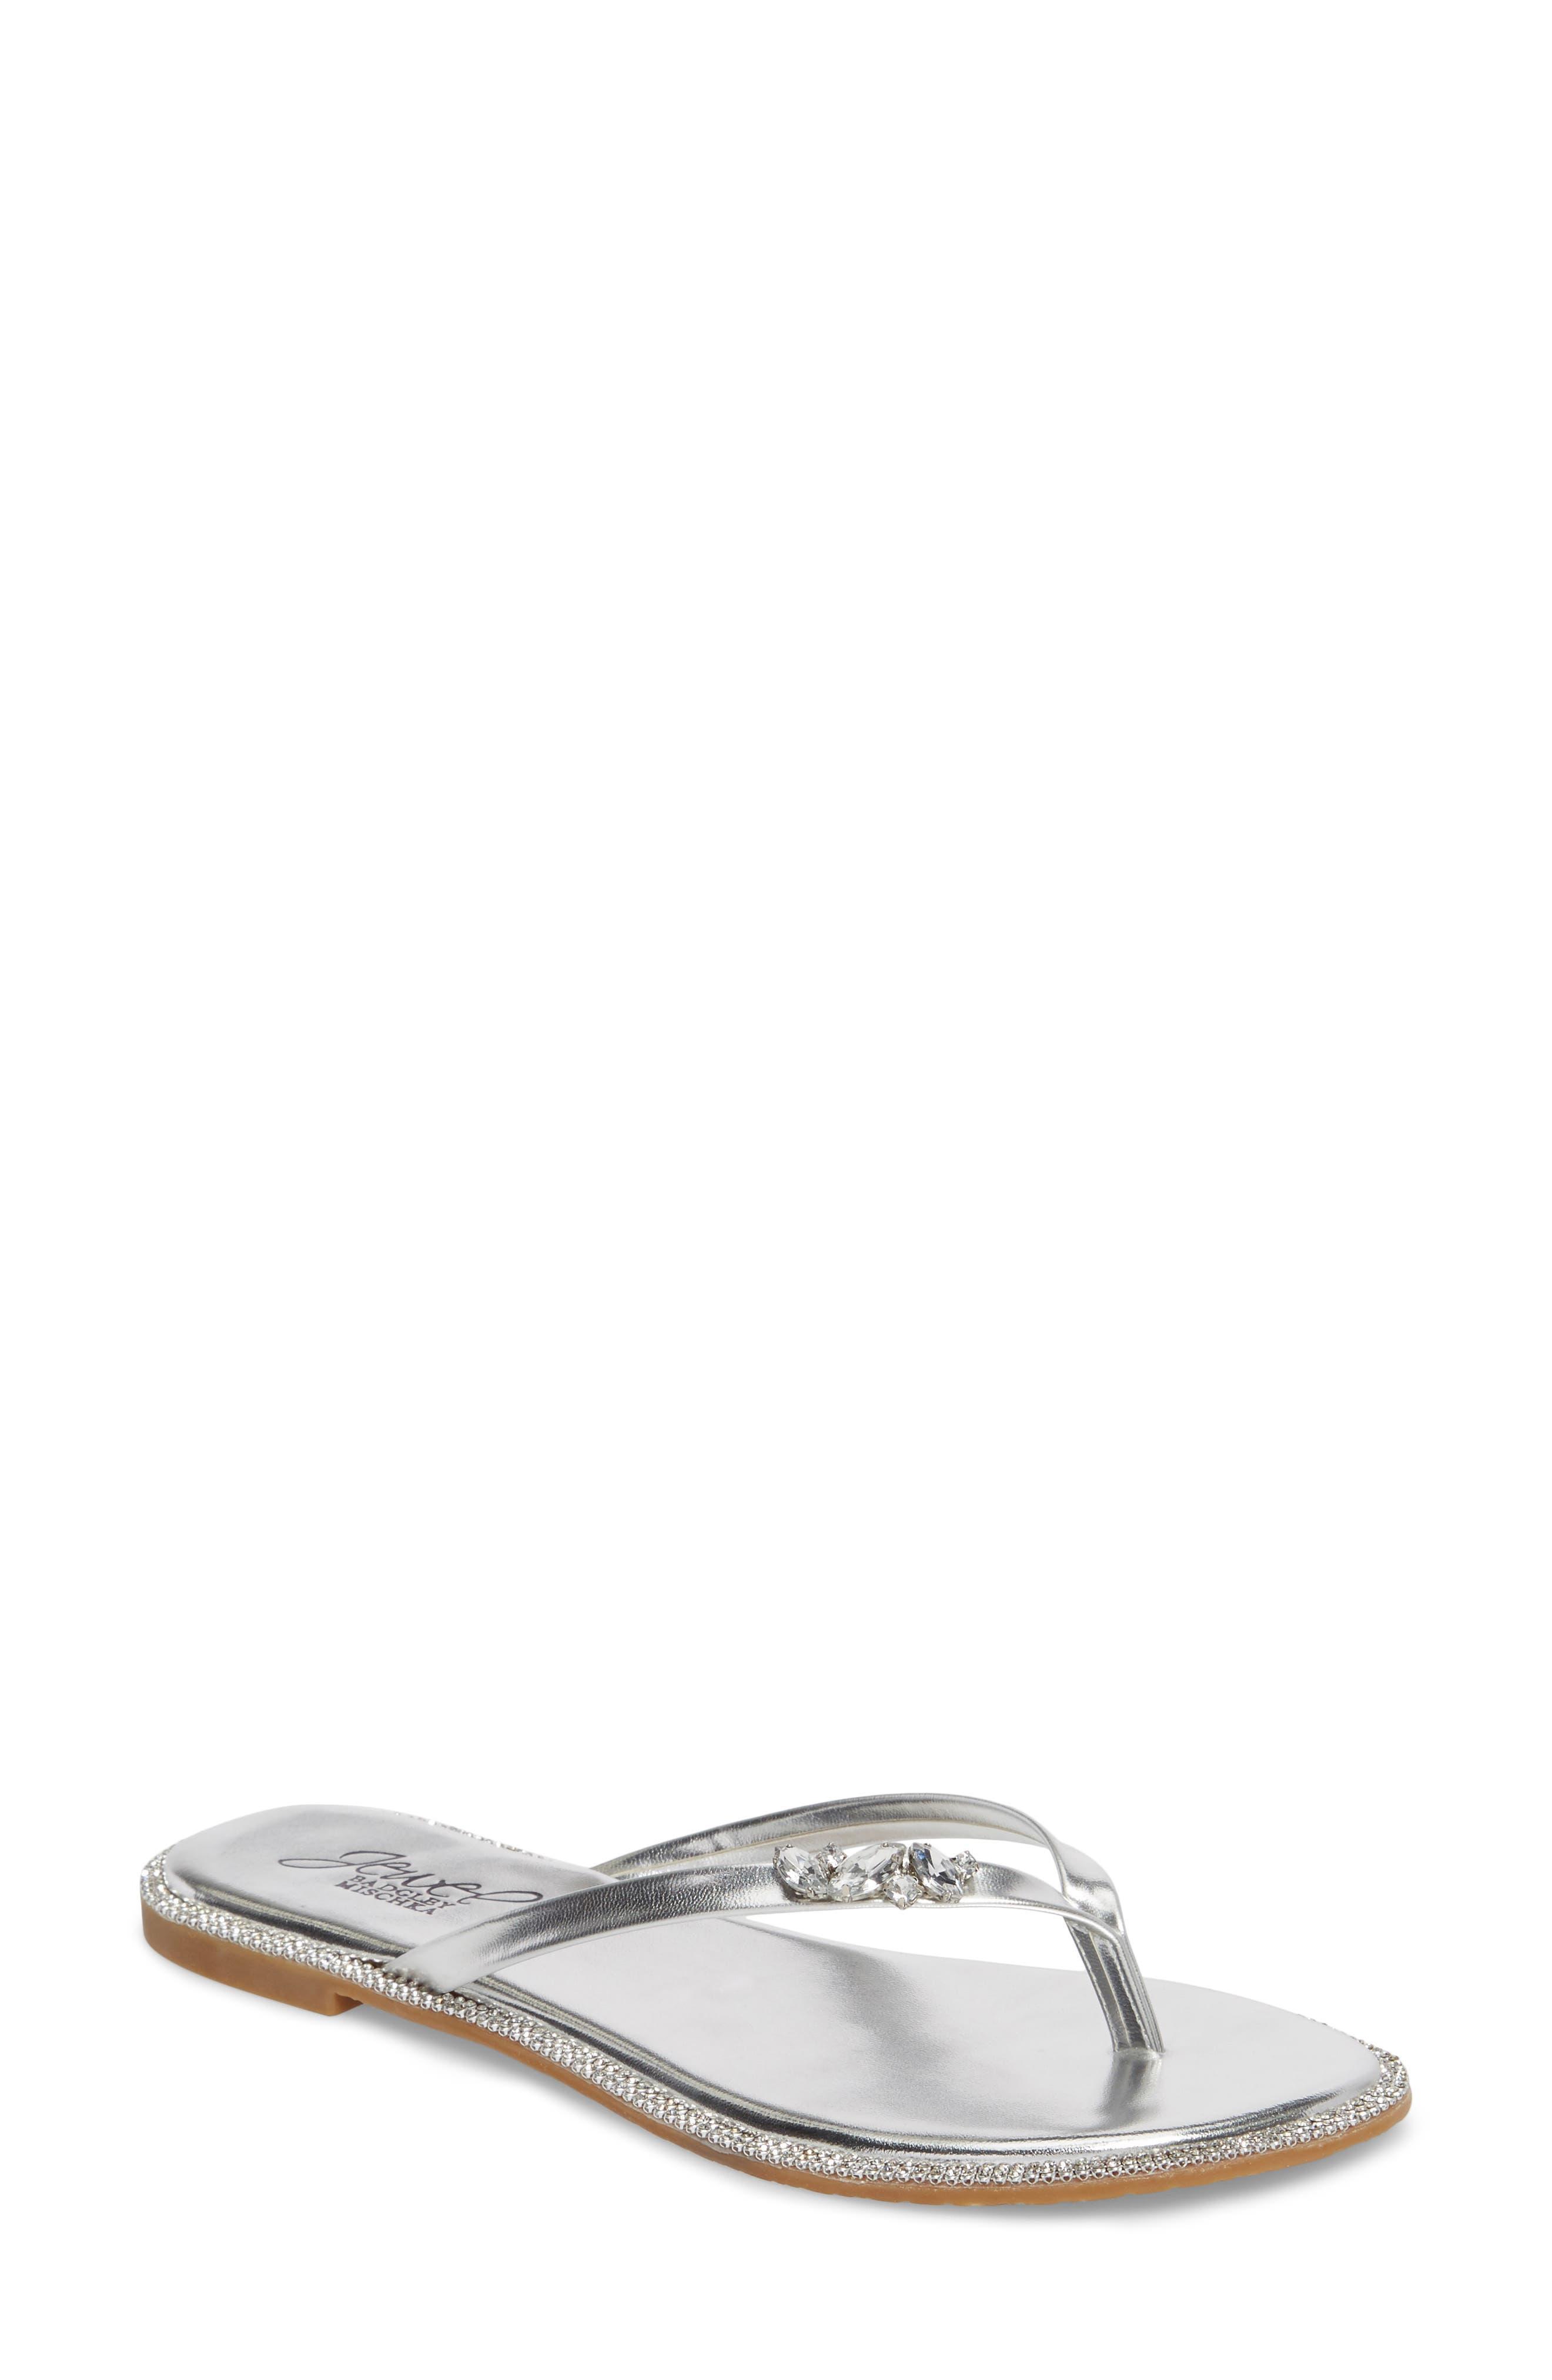 Thalia Crystal Embellished Flip Flop,                         Main,                         color, Silver Leather